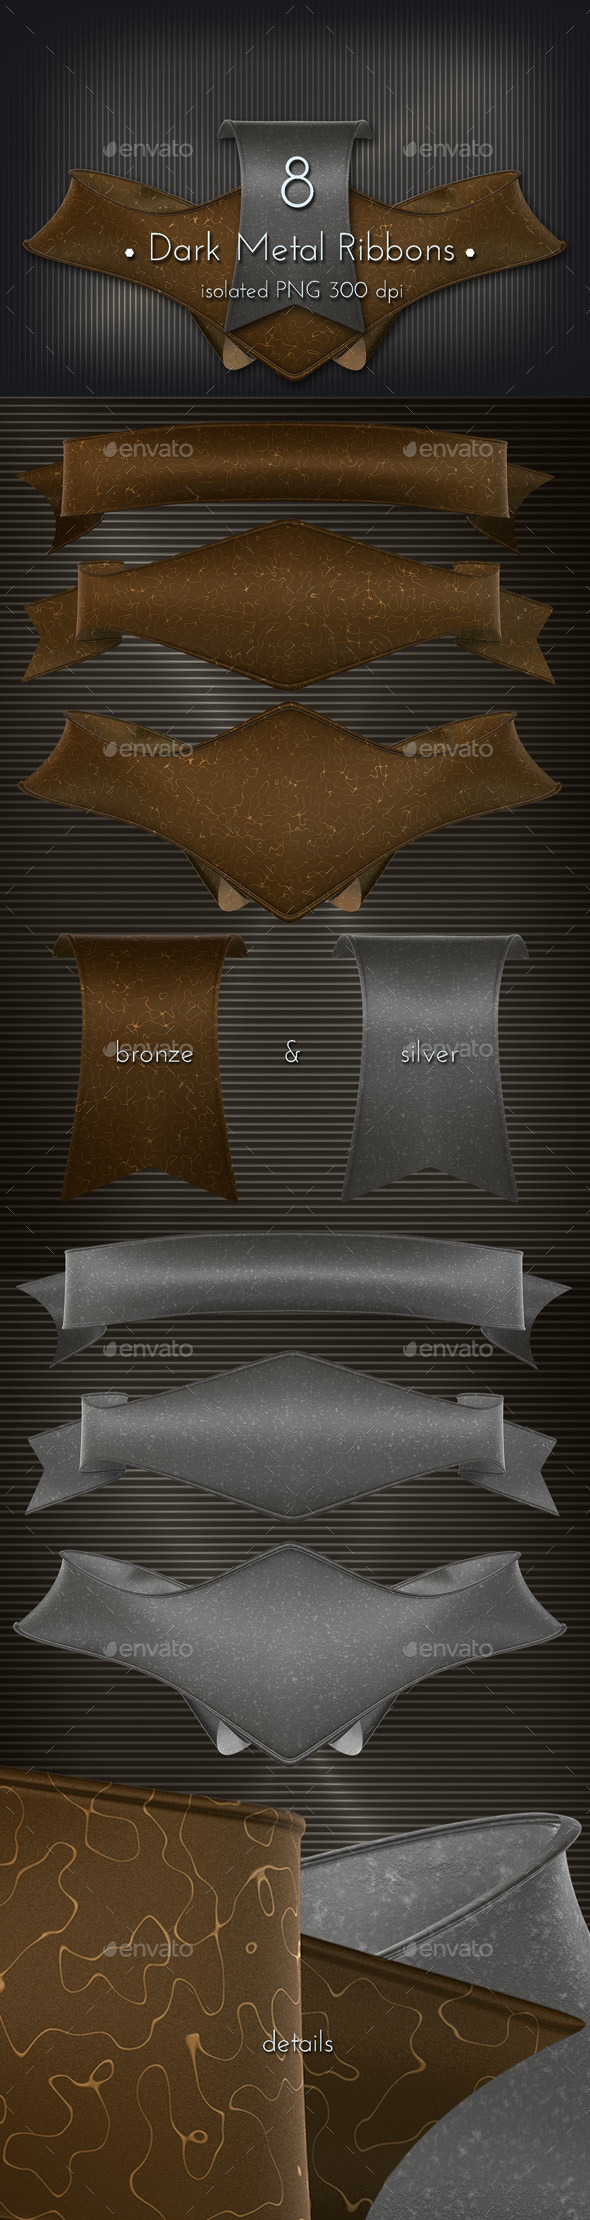 Dark Metal Ribbon - 3D Backgrounds